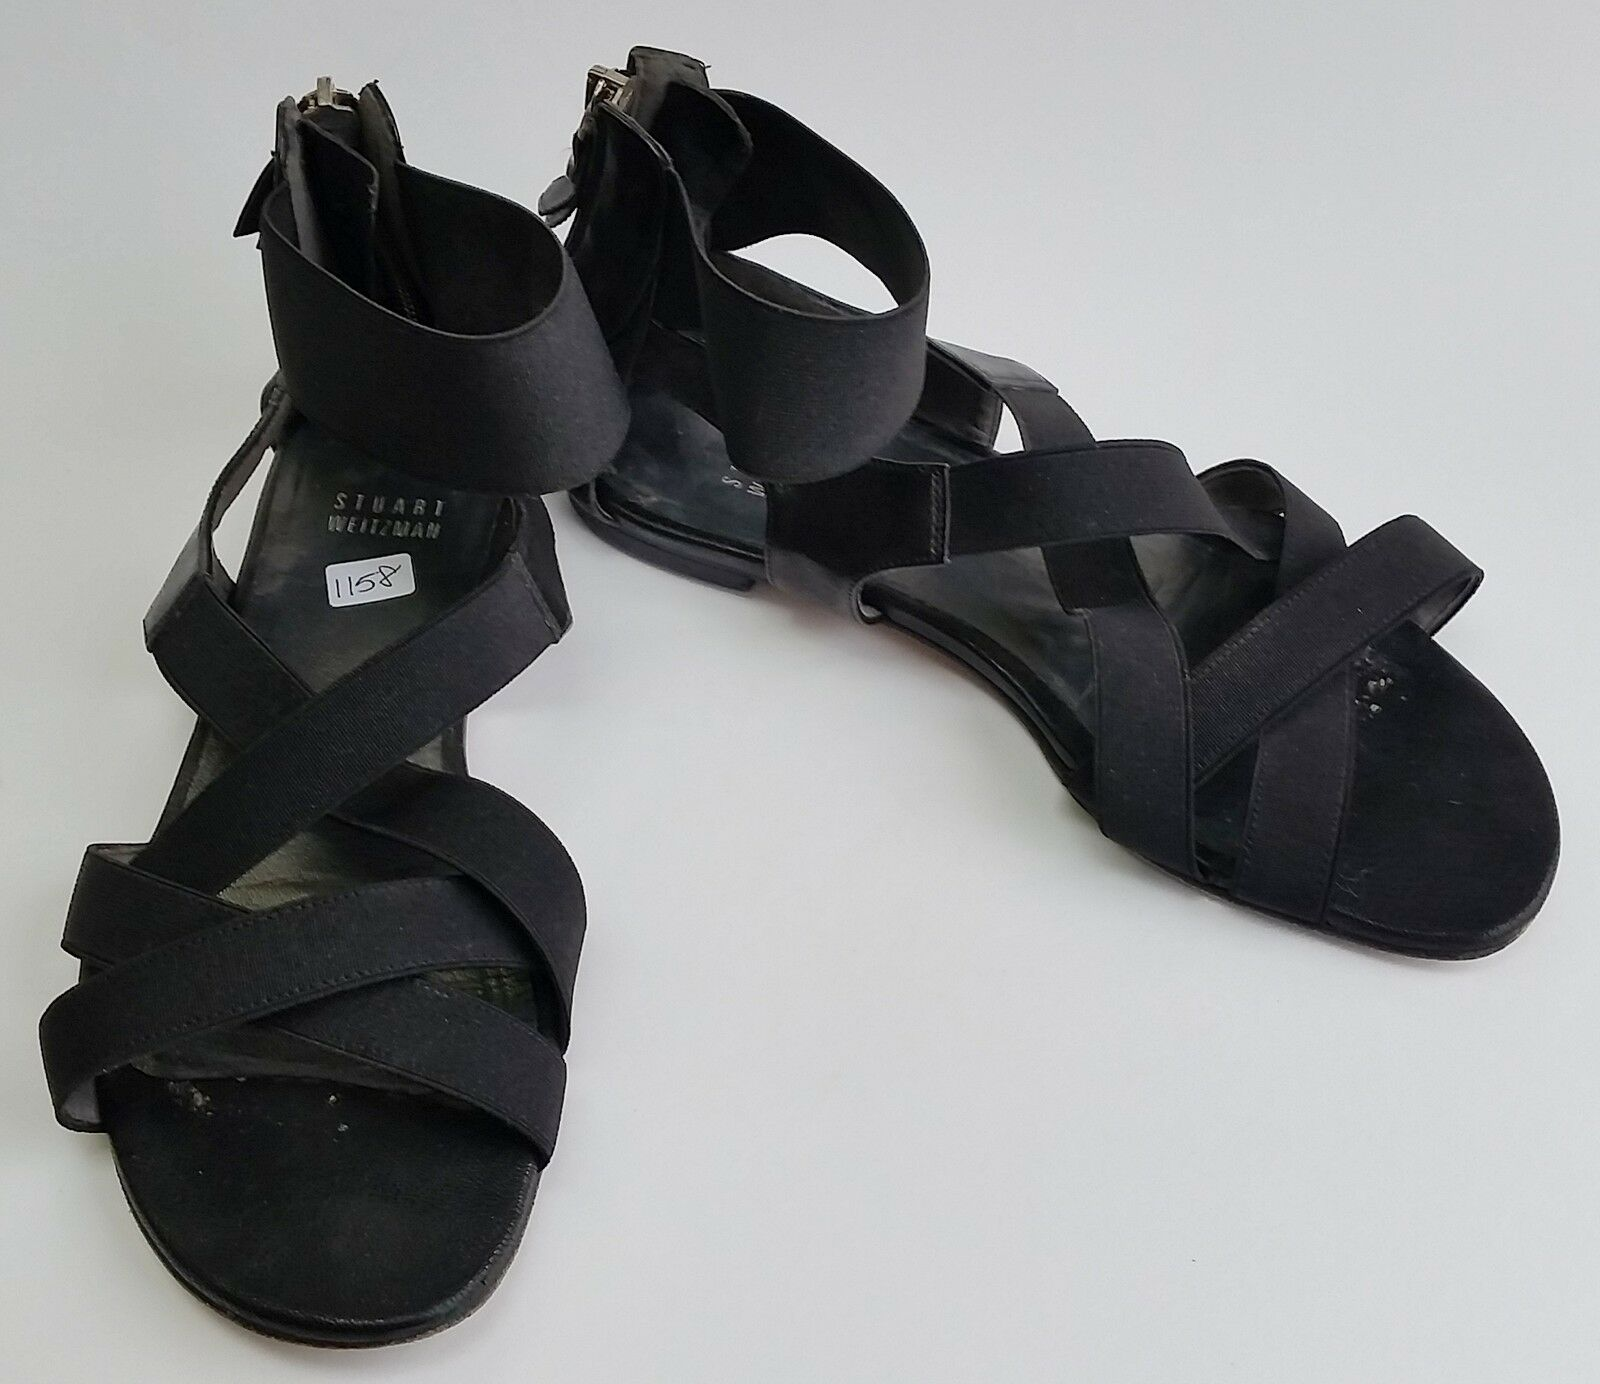 Stuart Weitzman shoes Sandals Black Flats Zipper at Heel Strappy Womens Size 7.5